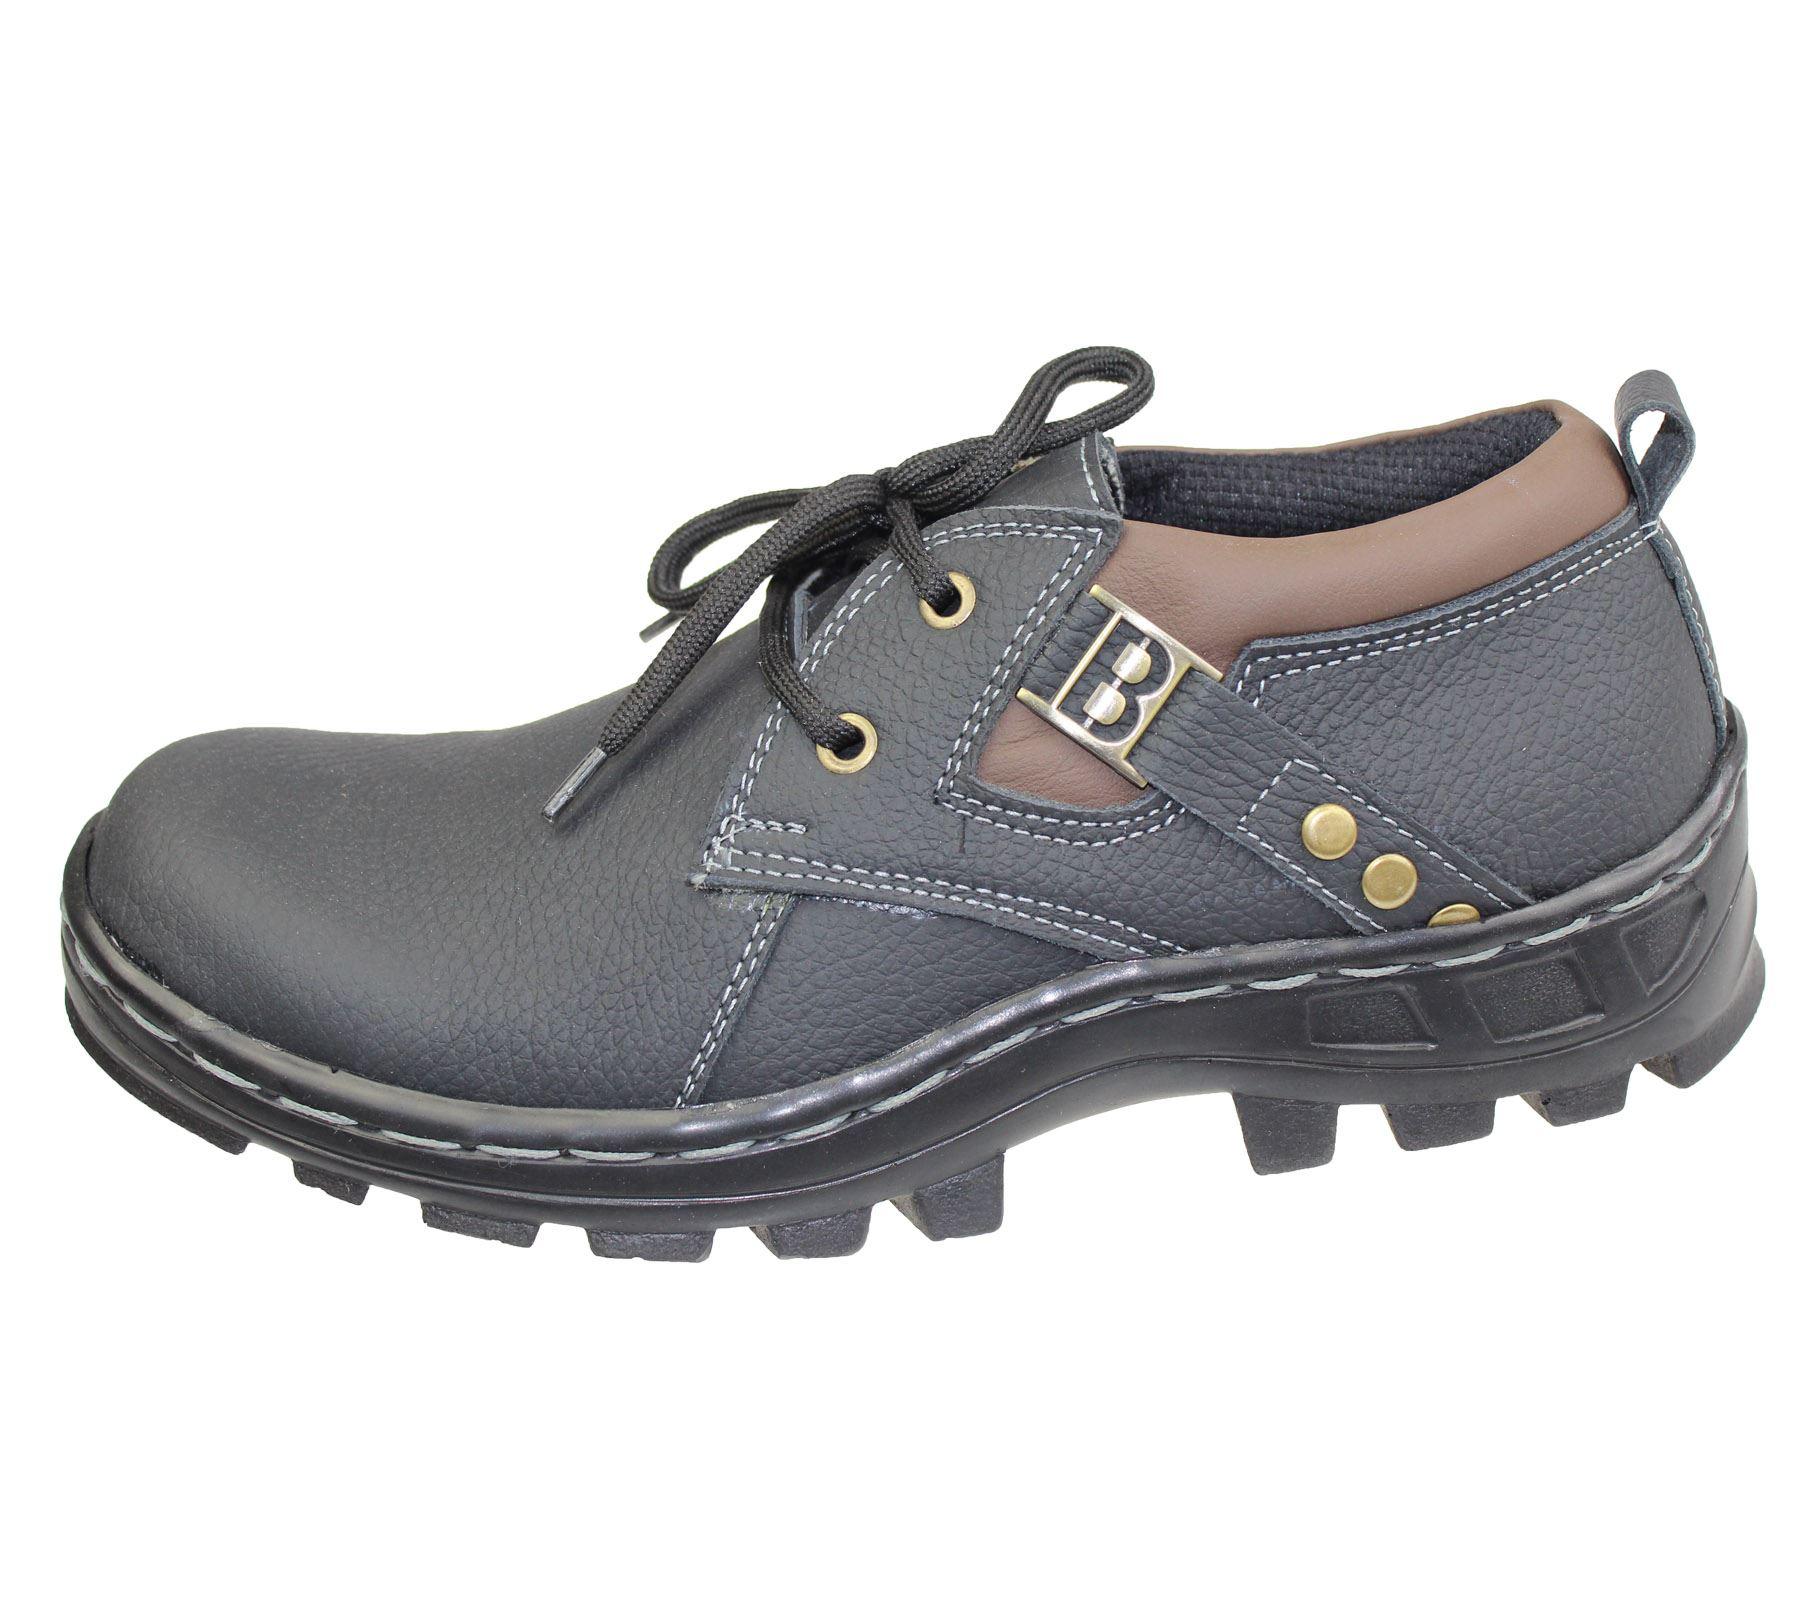 Mens Walking Shoes For Overpronation